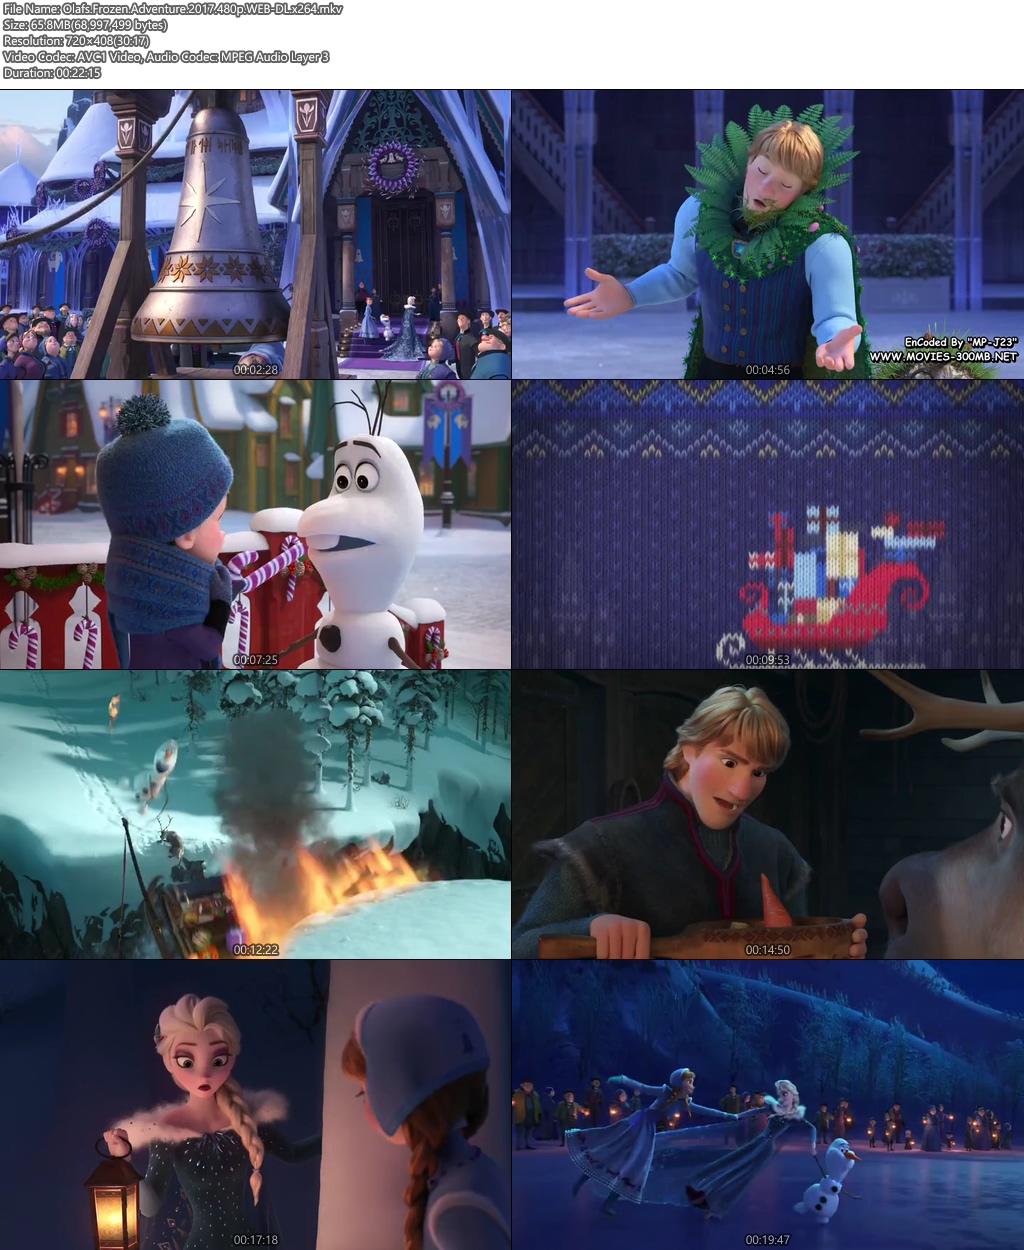 Olafs Frozen Adventure 2017 480p WEB-DL 100MB x264 Screenshot